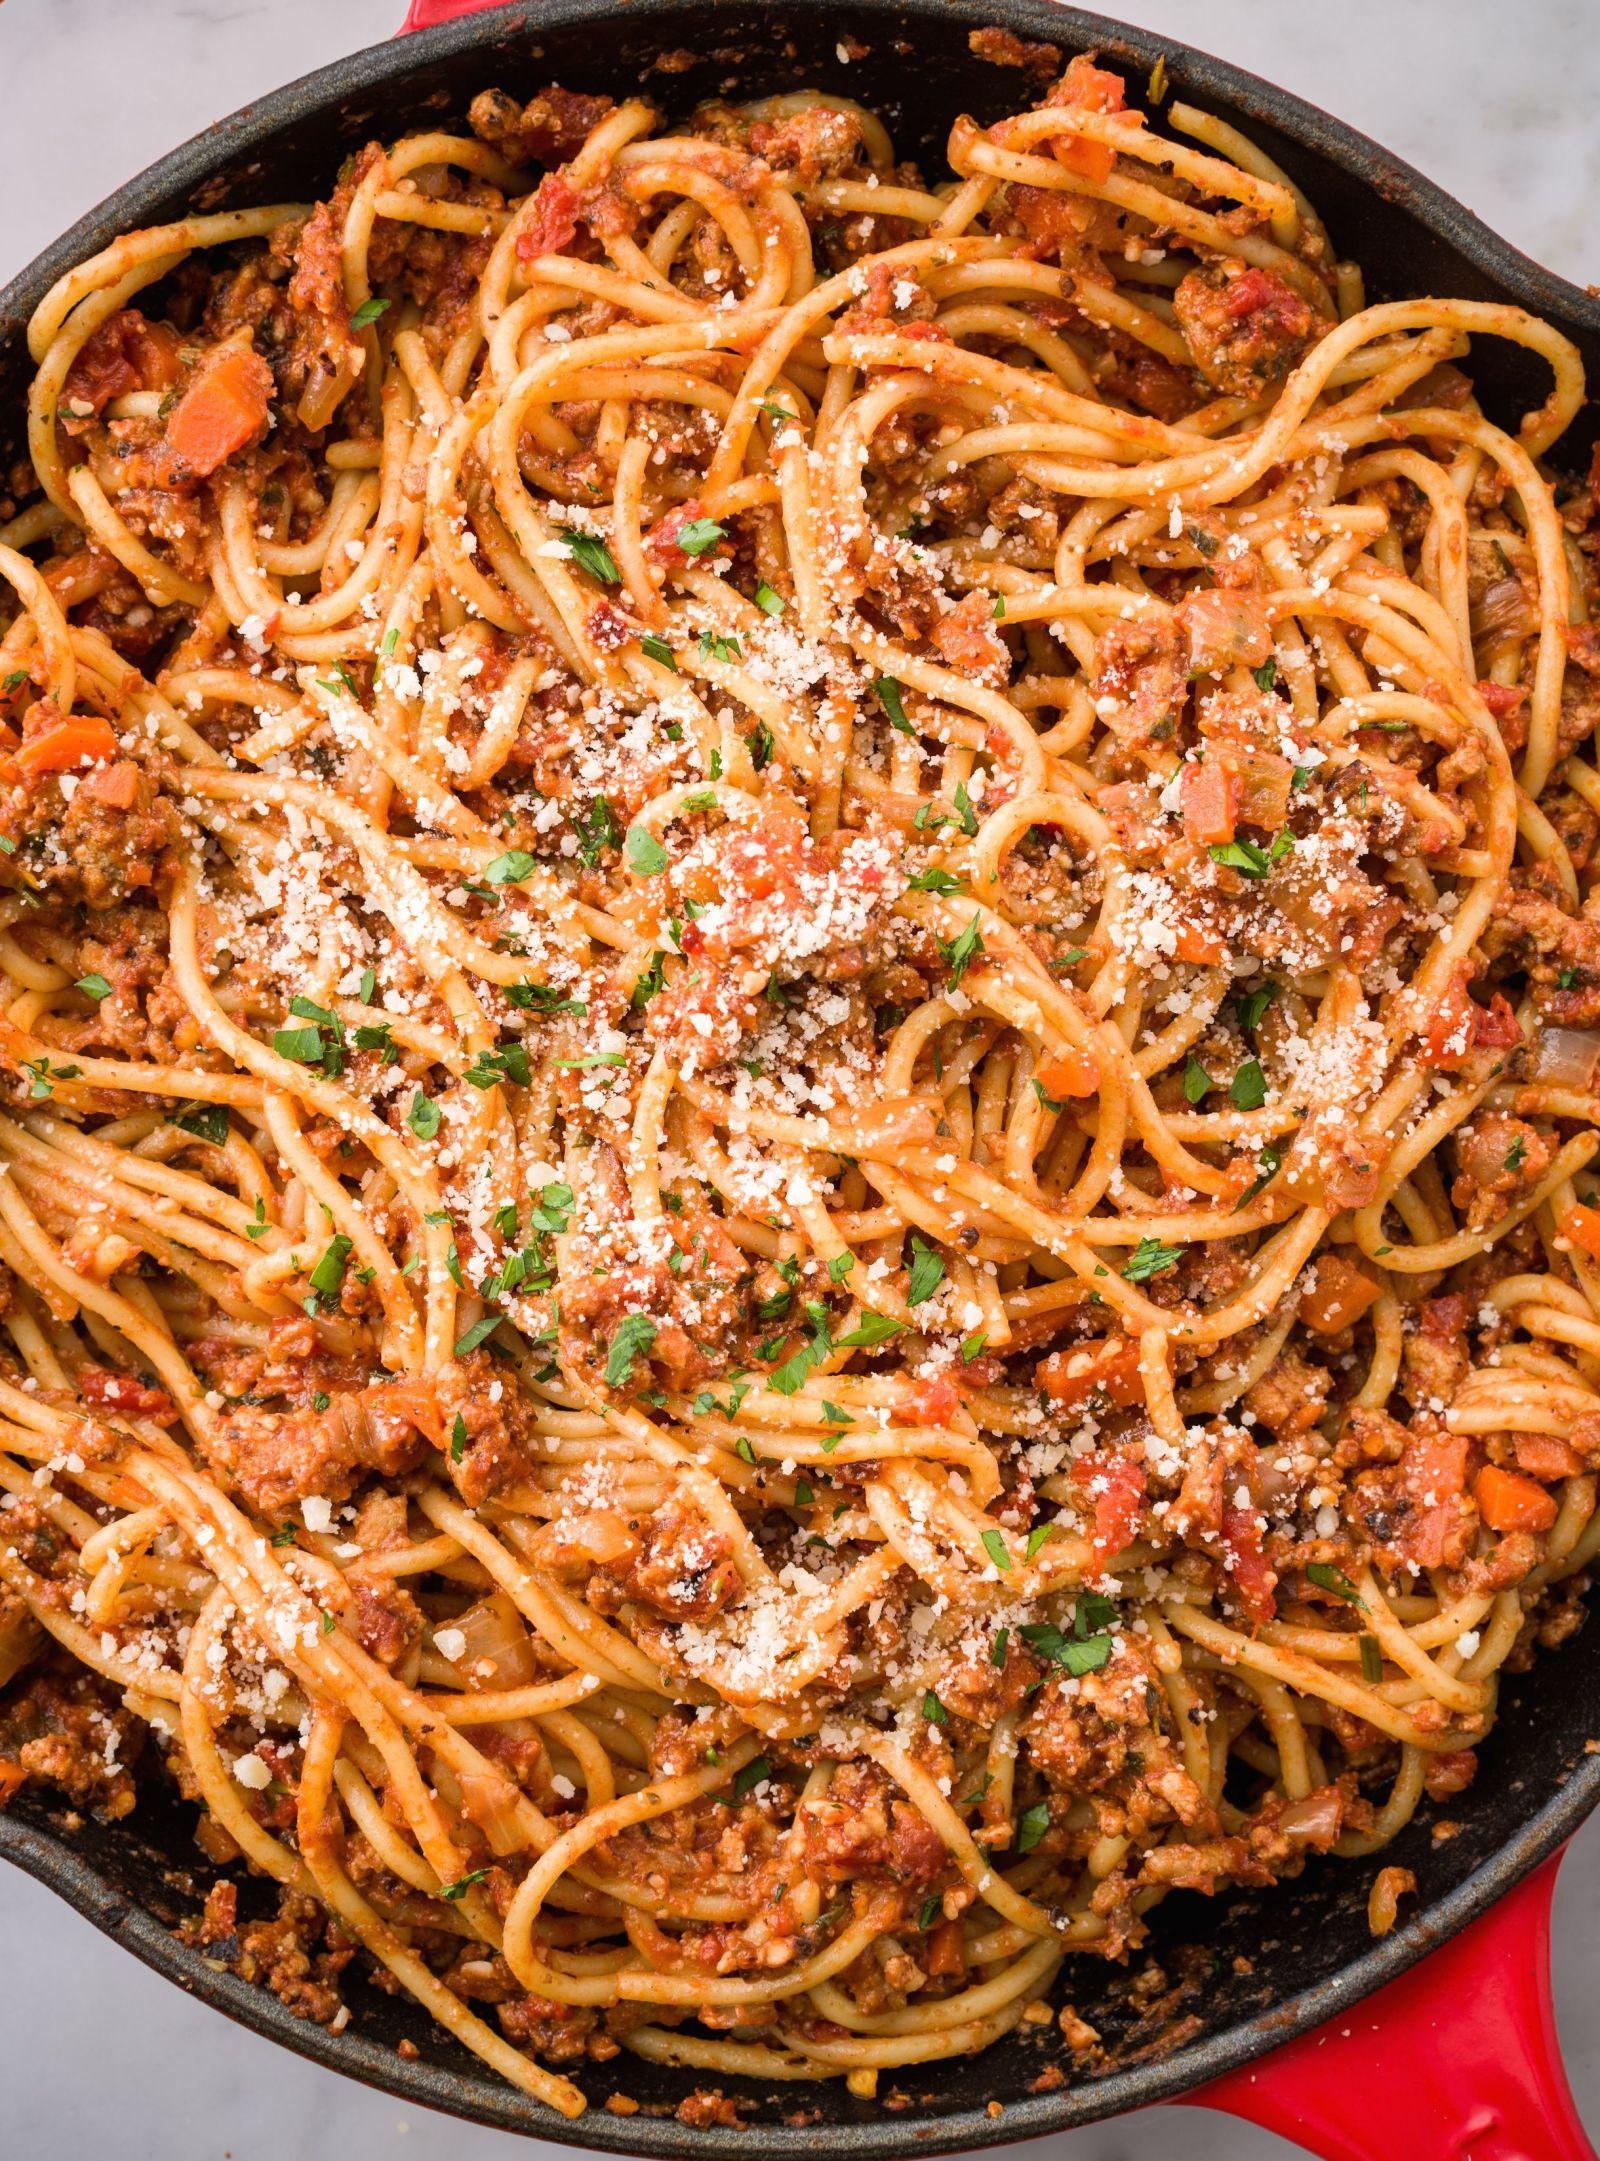 Spaghetti With Turkey Ragu Recipe Ground Turkey Recipes Healthy Healthy Turkey Recipes Ground Turkey Pasta Recipes